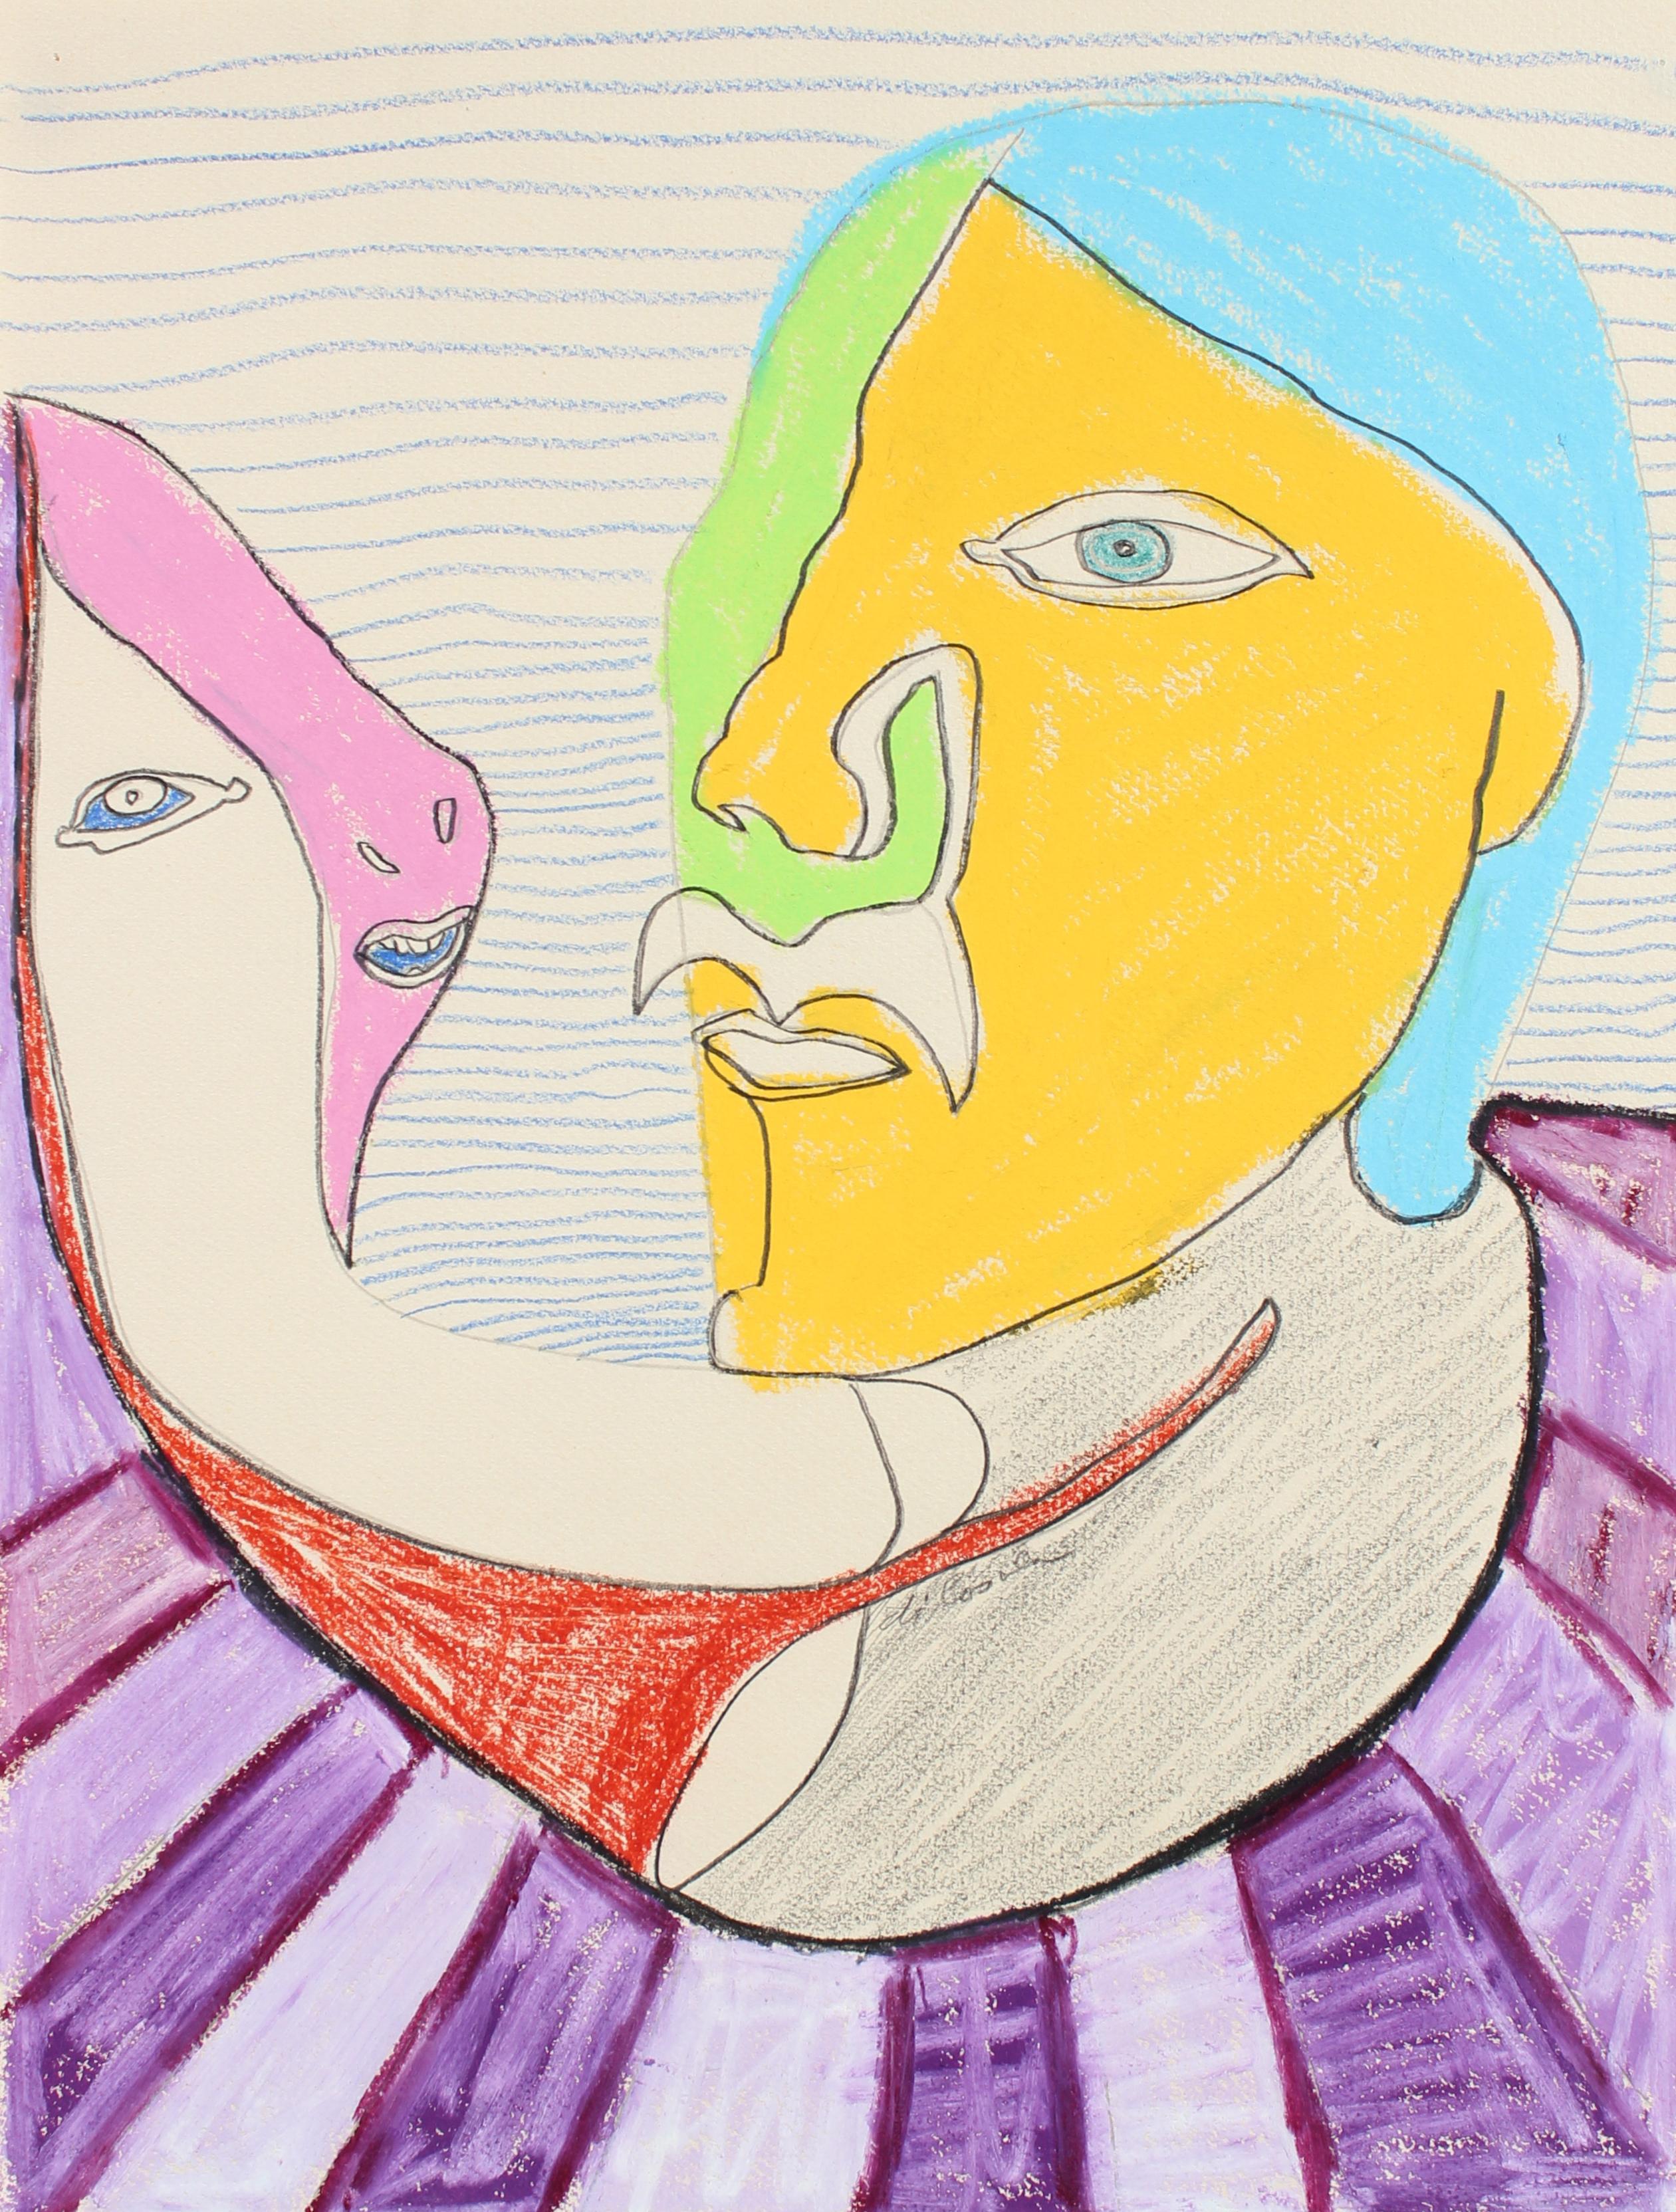 Surreal Faces Conversing Late 20th Century Pastel & Graphite